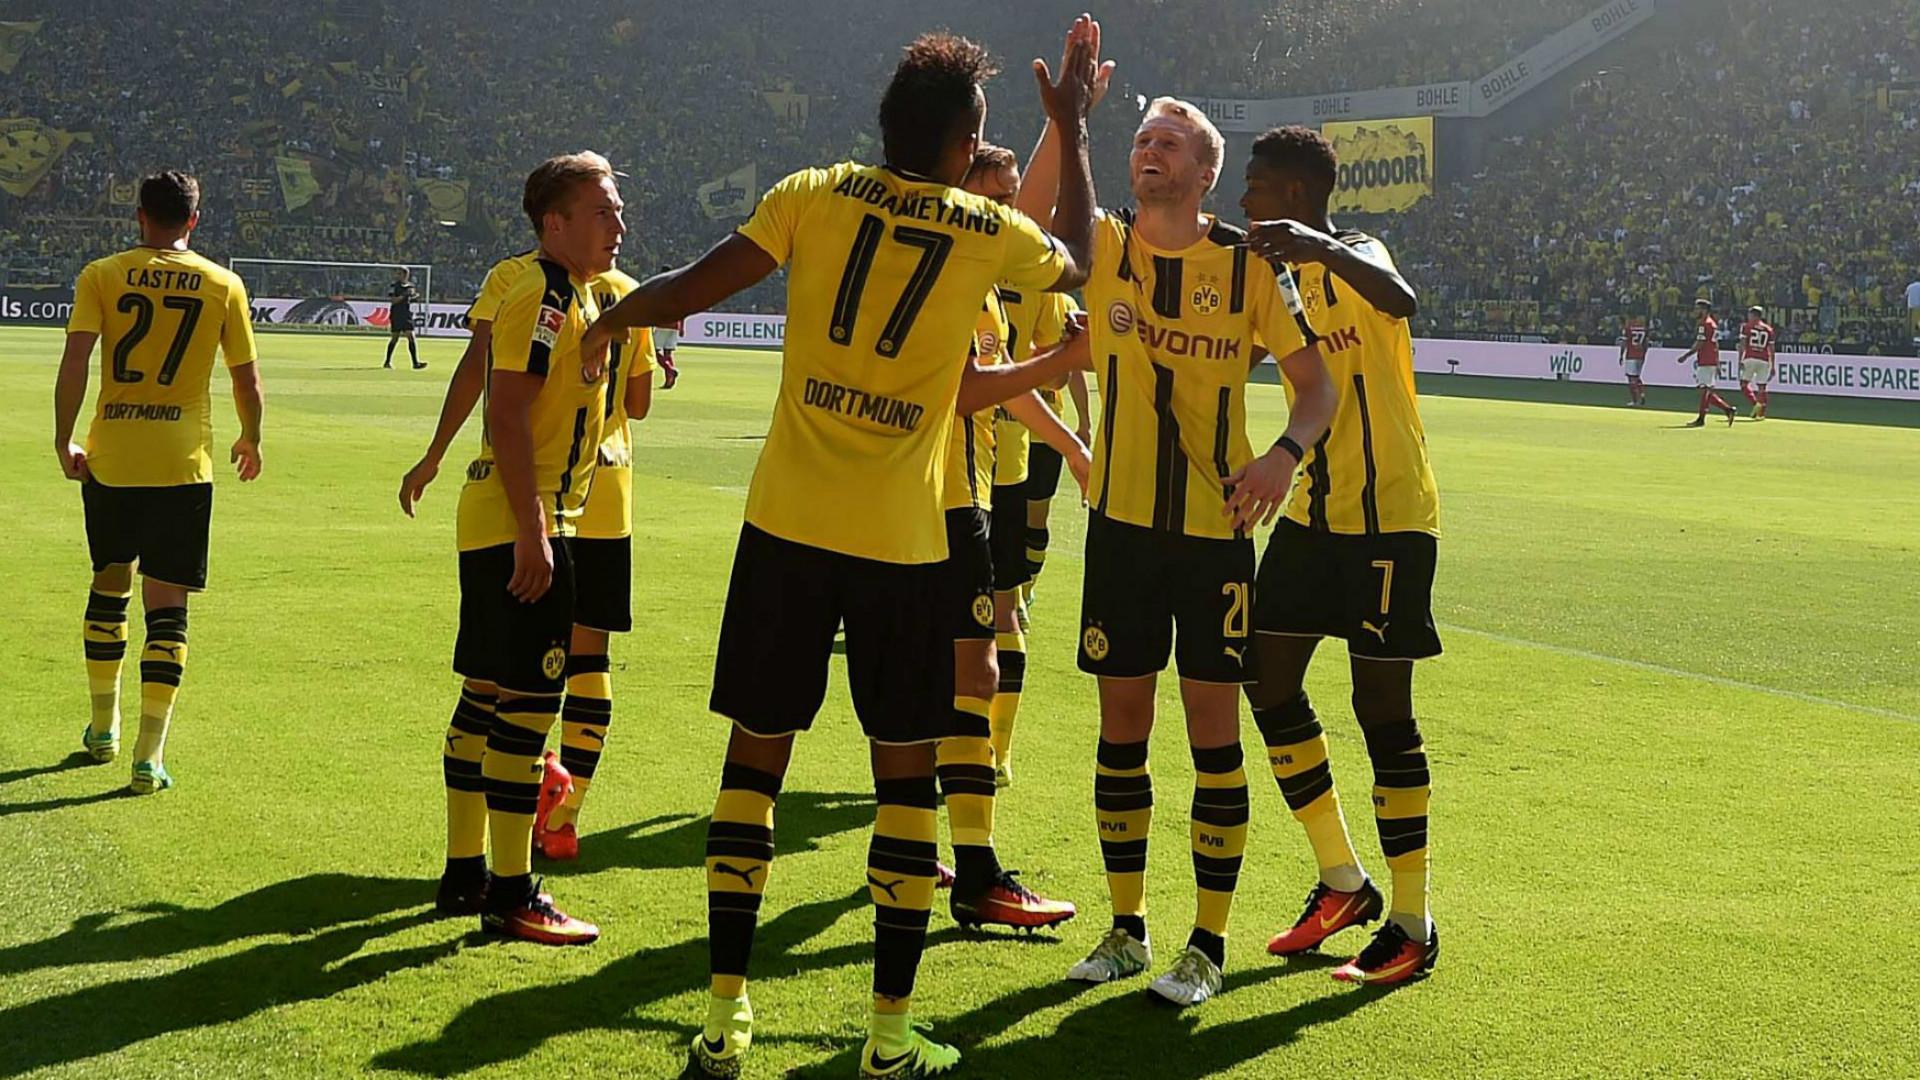 Borussia dortmund players german bundesliga 27082016 - Germany bundesliga league table ...